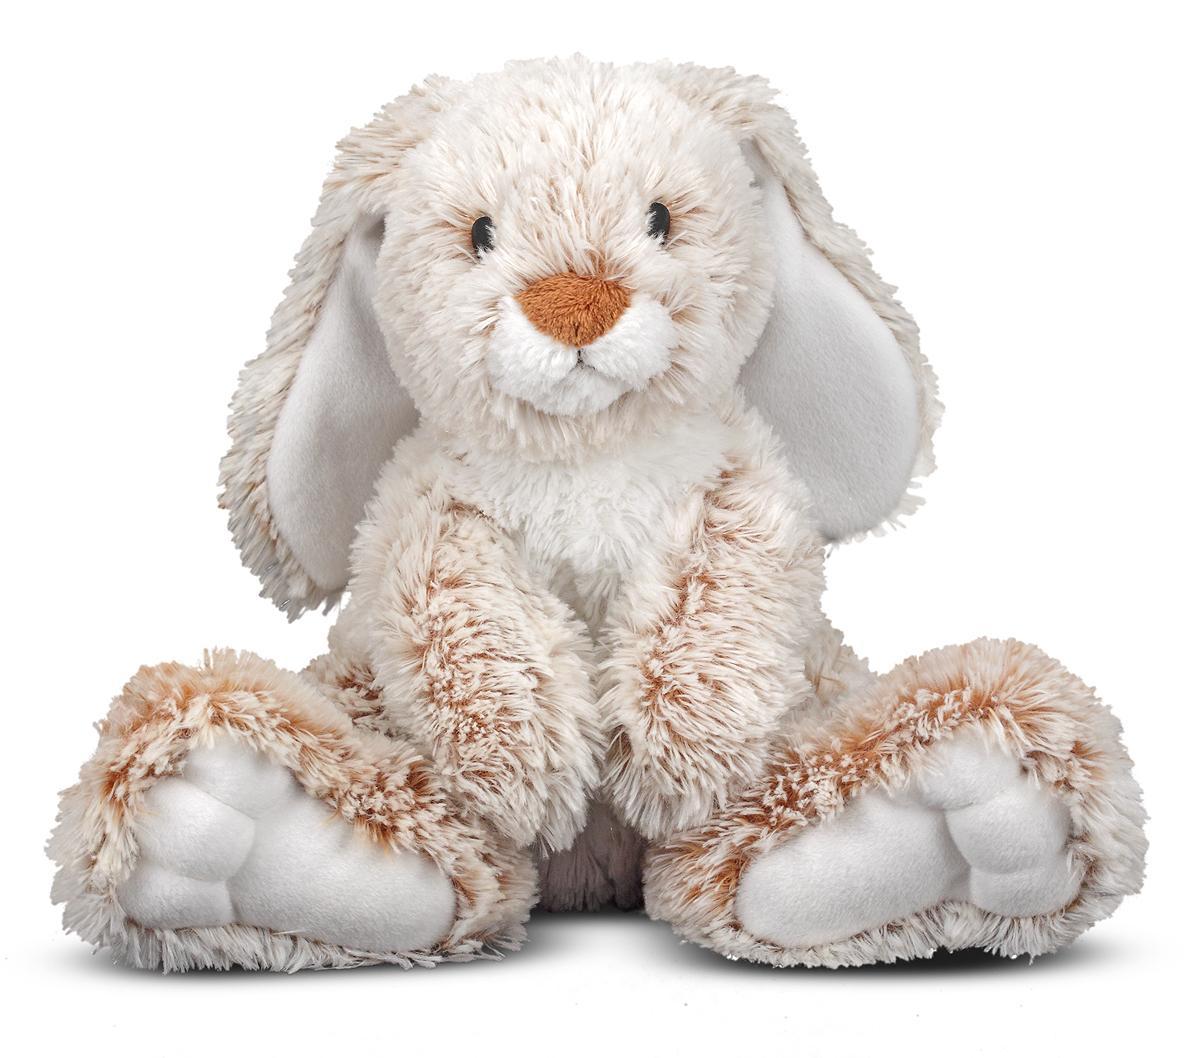 melissa doug burrow bunny rabbit stuffed animal washable surface soft fabric 9. Black Bedroom Furniture Sets. Home Design Ideas